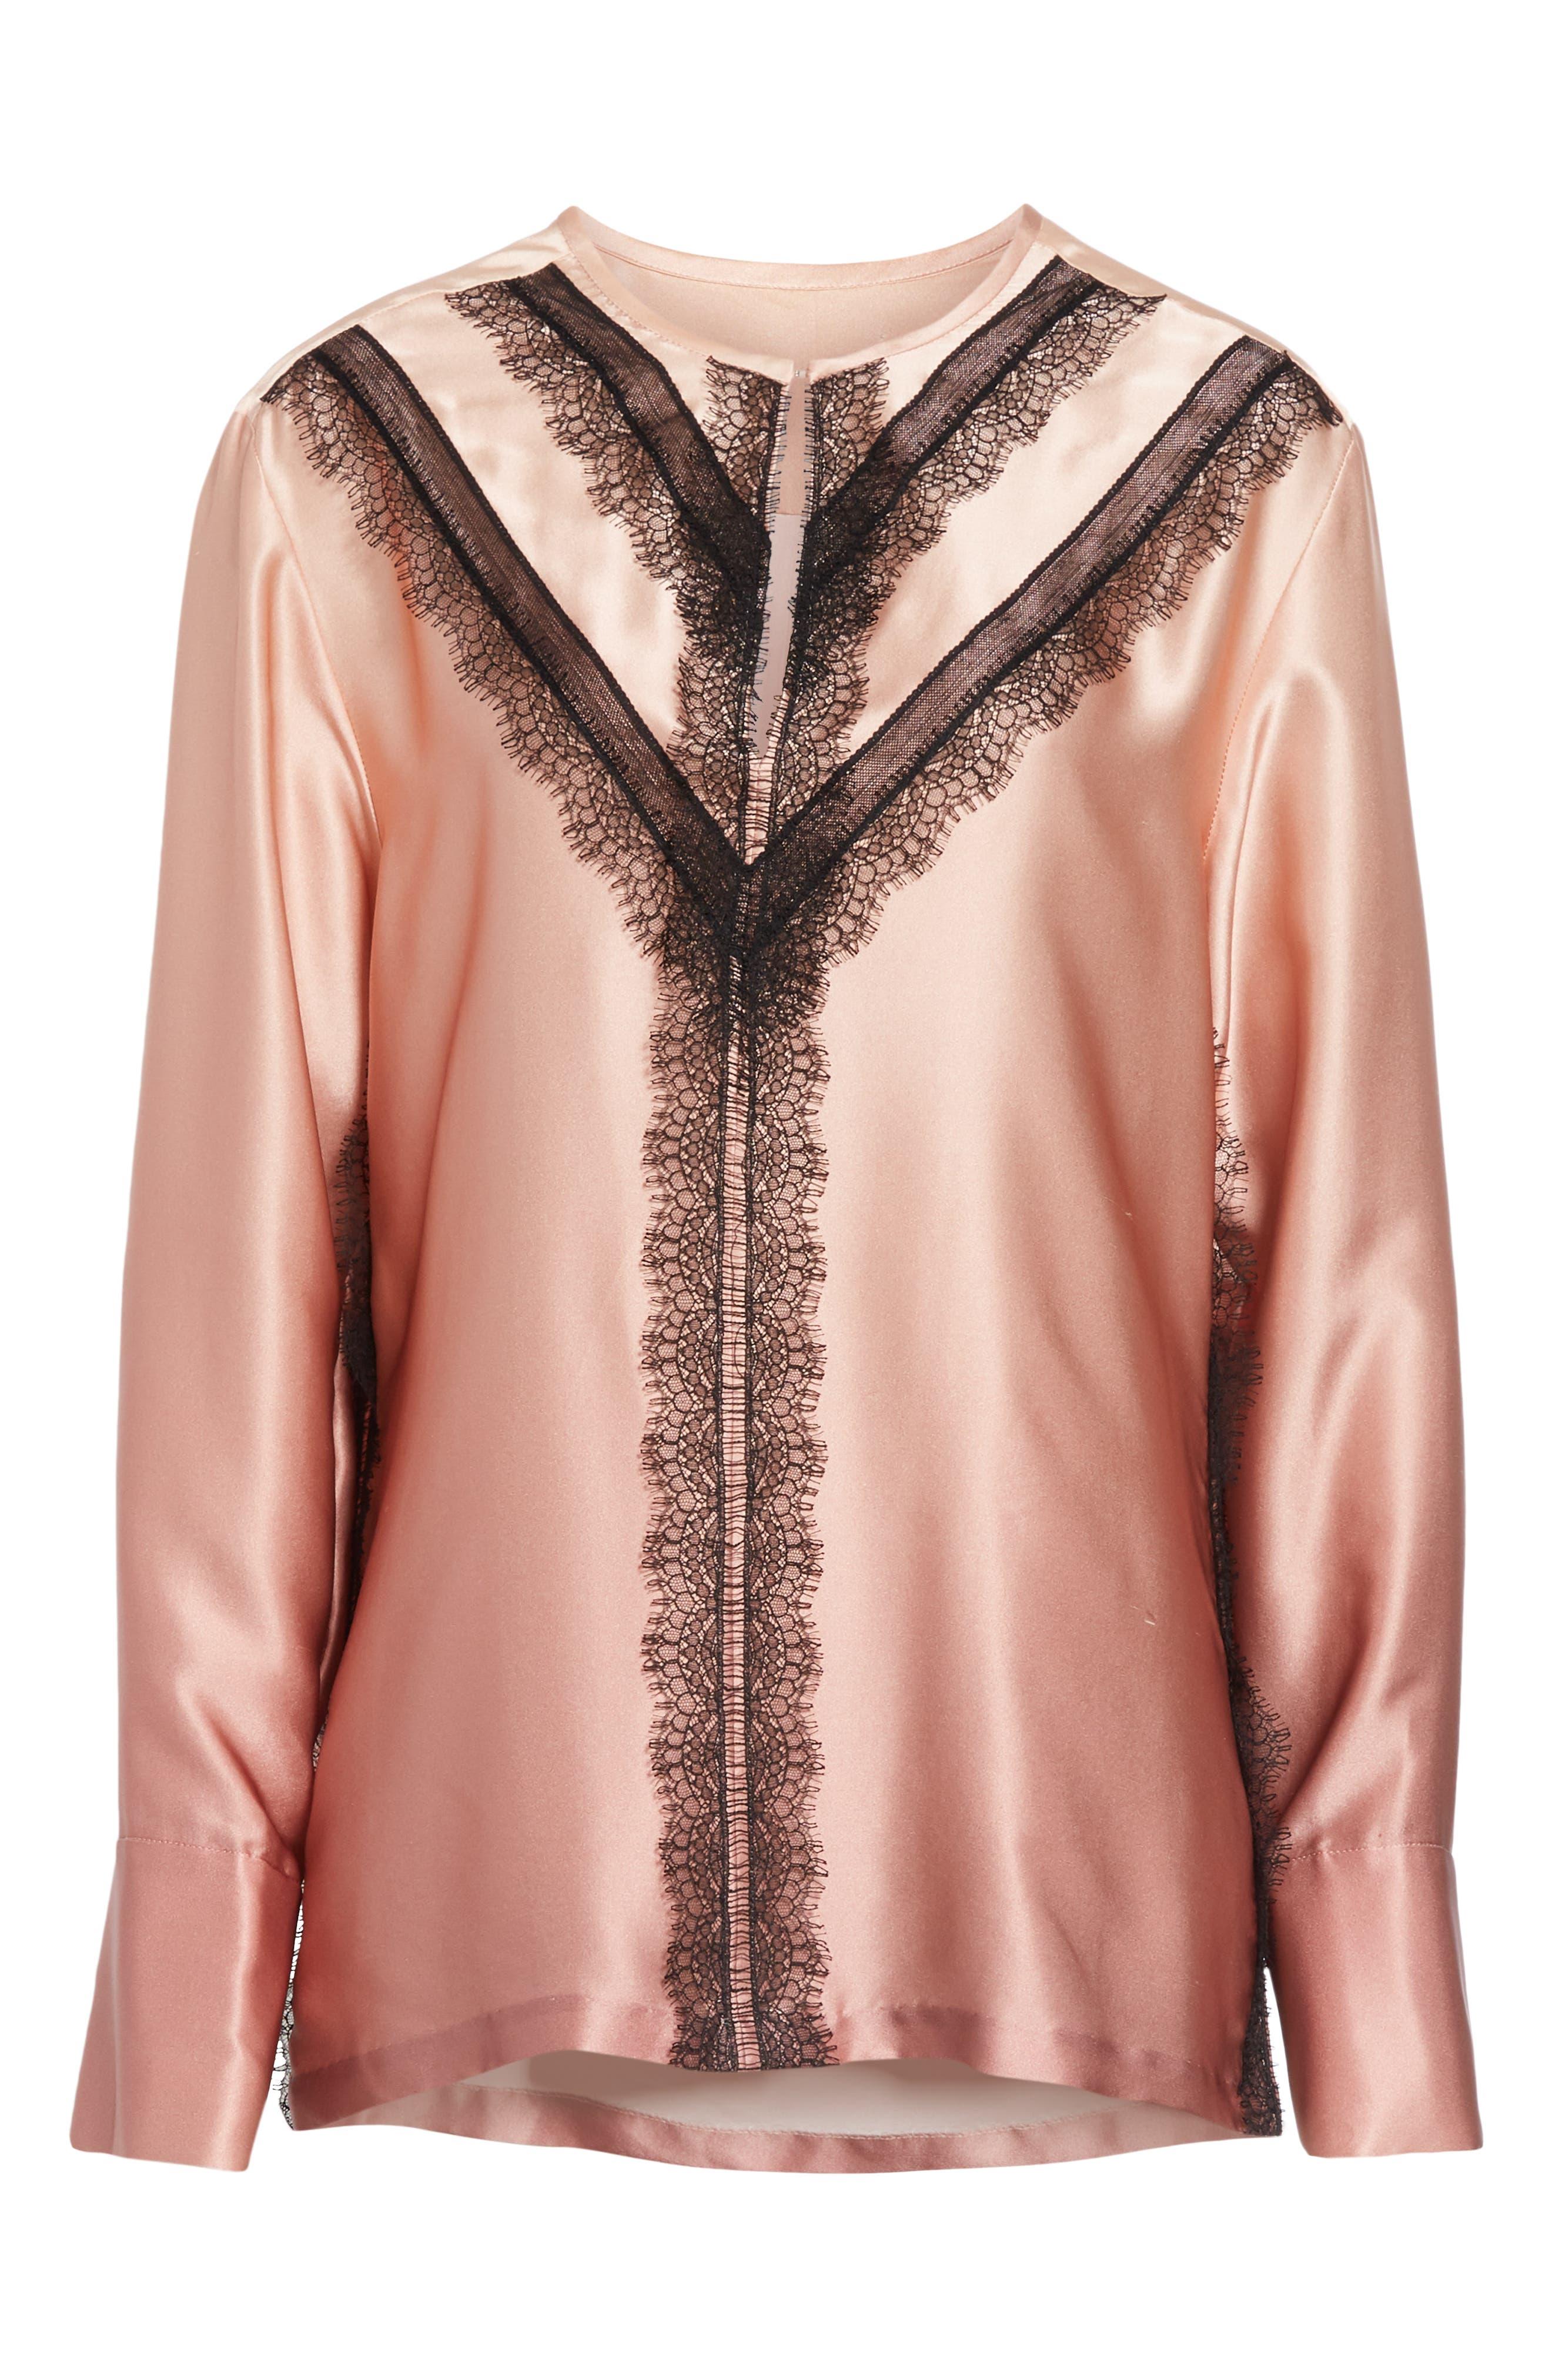 GREY Jason Wu Ombré Silk Shirt,                             Alternate thumbnail 6, color,                             DESERT ROSE